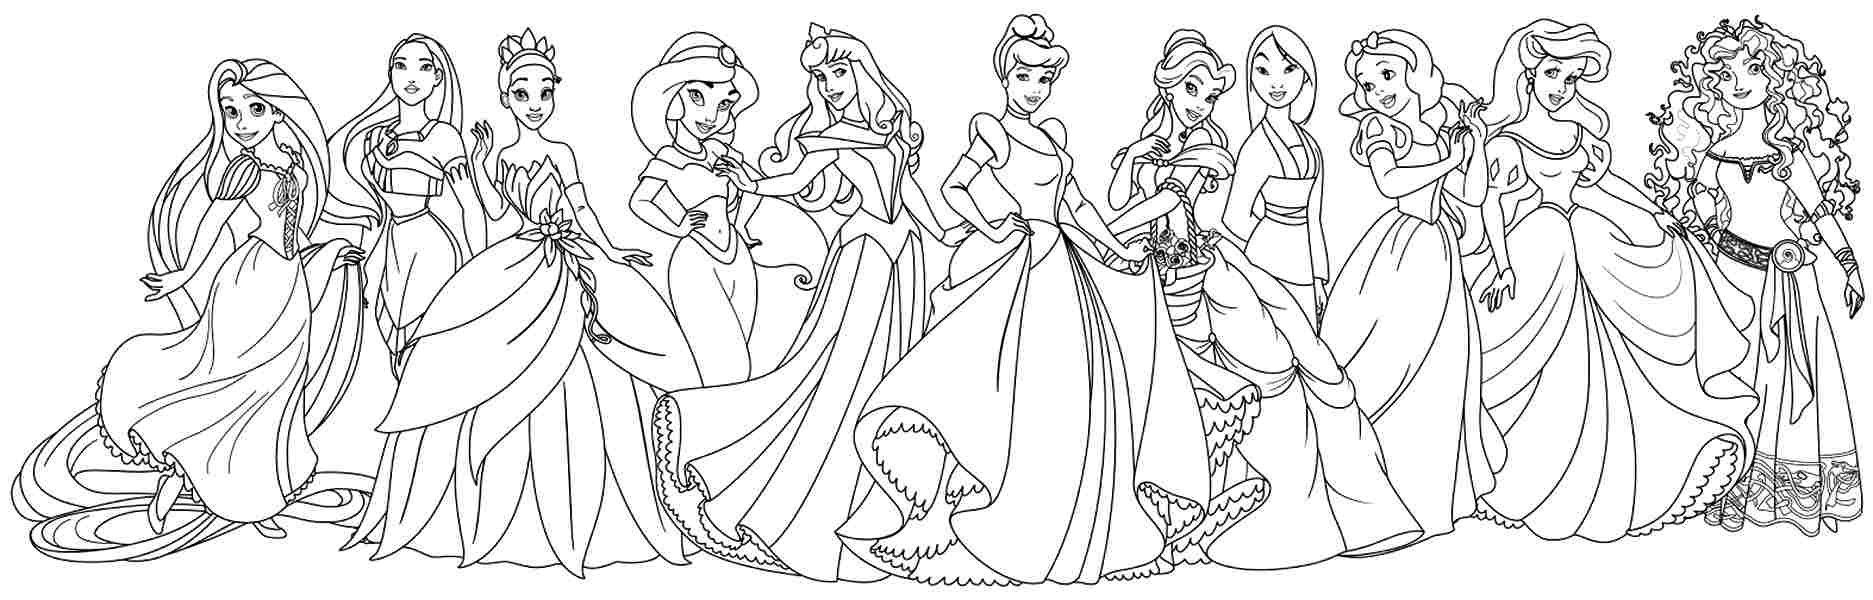 Онлайн разукрашки принцесс